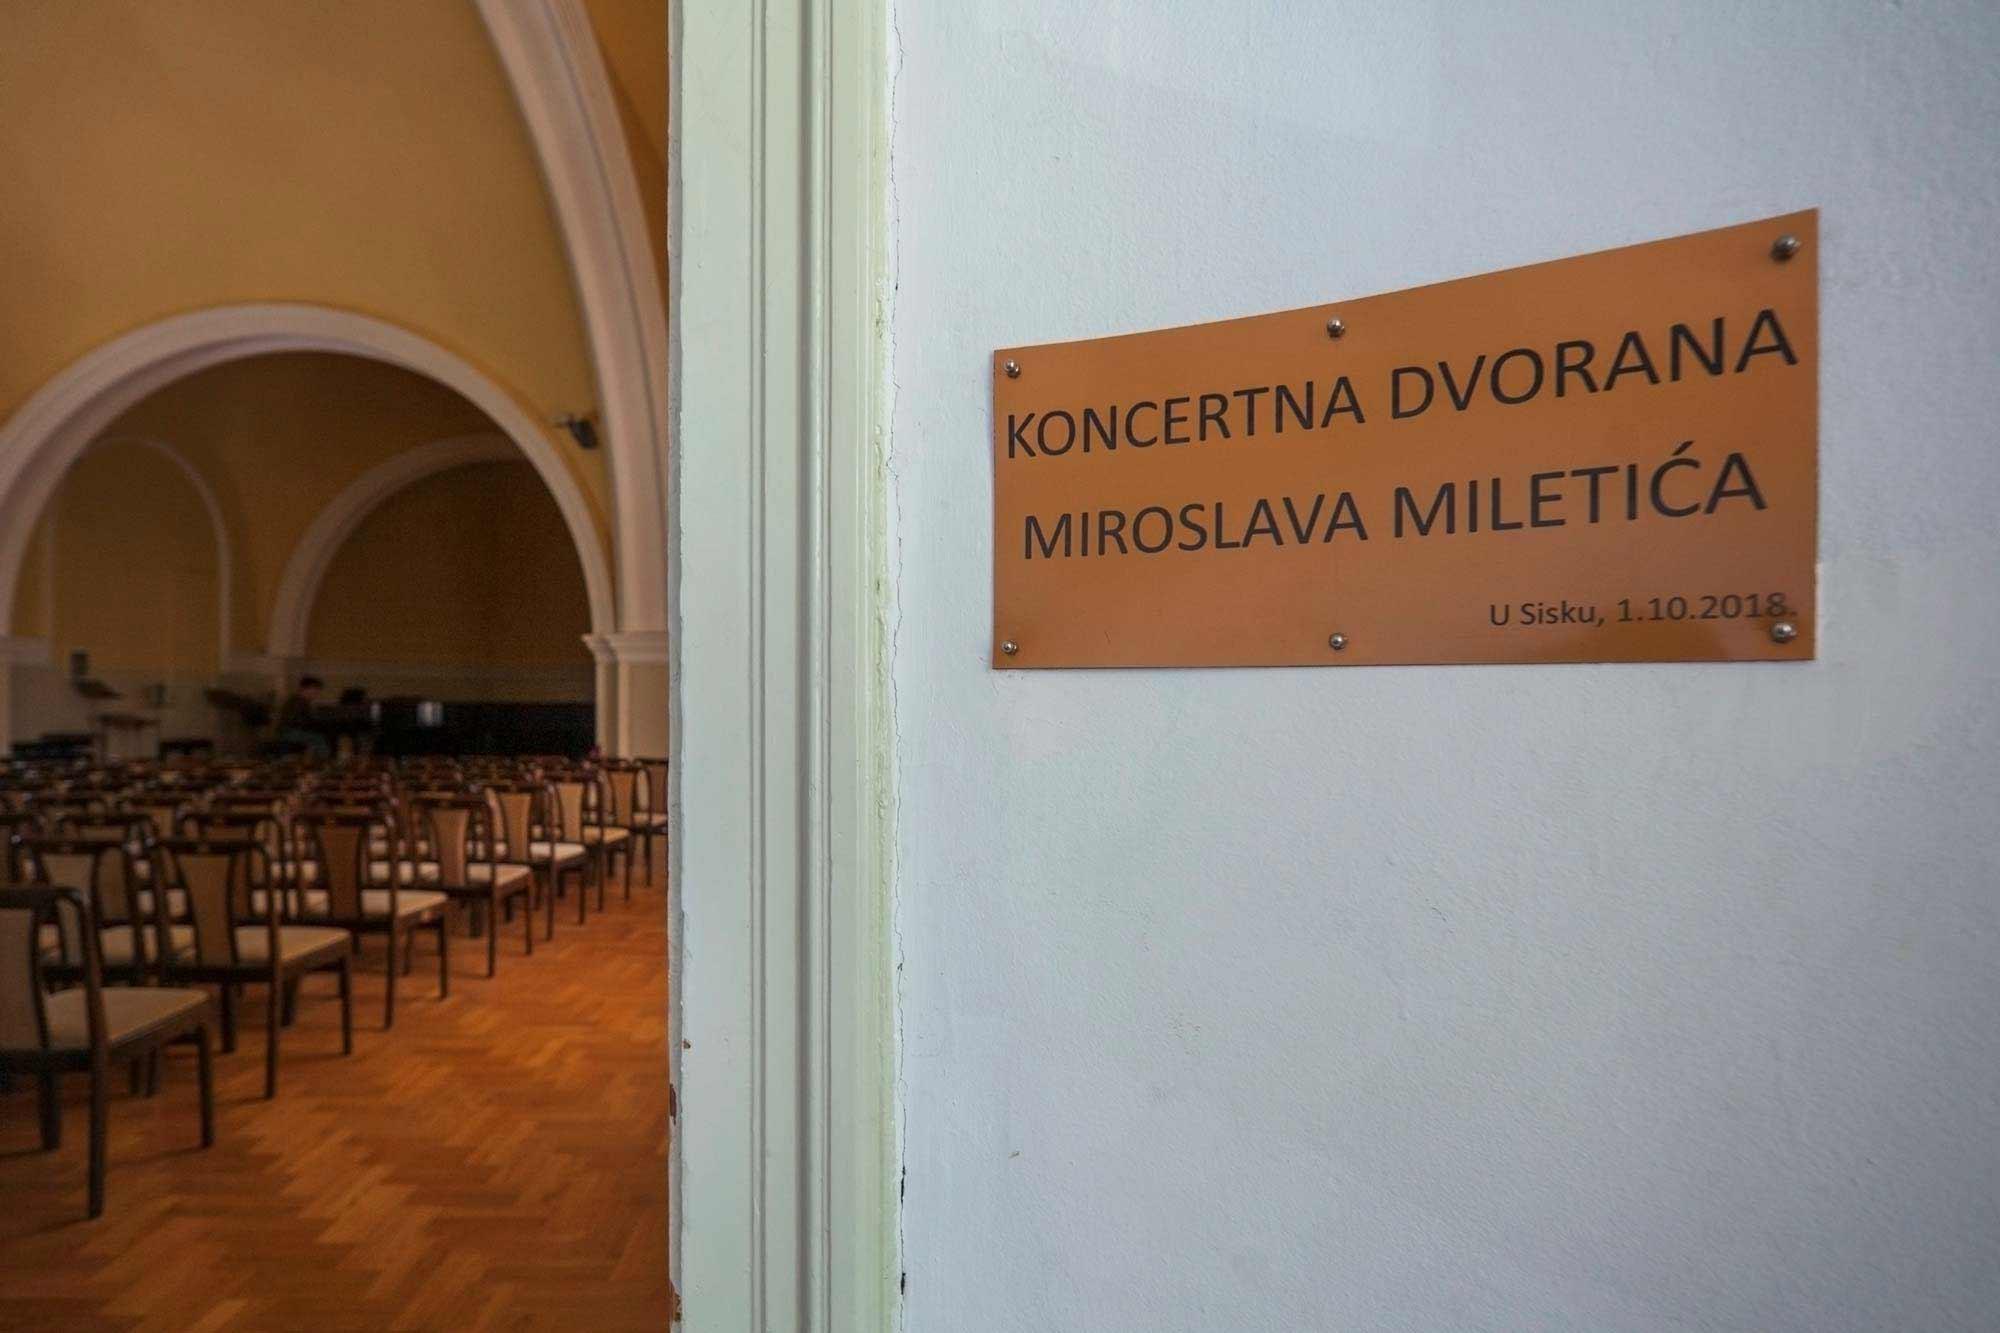 Glazbena škola Frana Lhotke Koncertna dvorana Miroslava Mileti